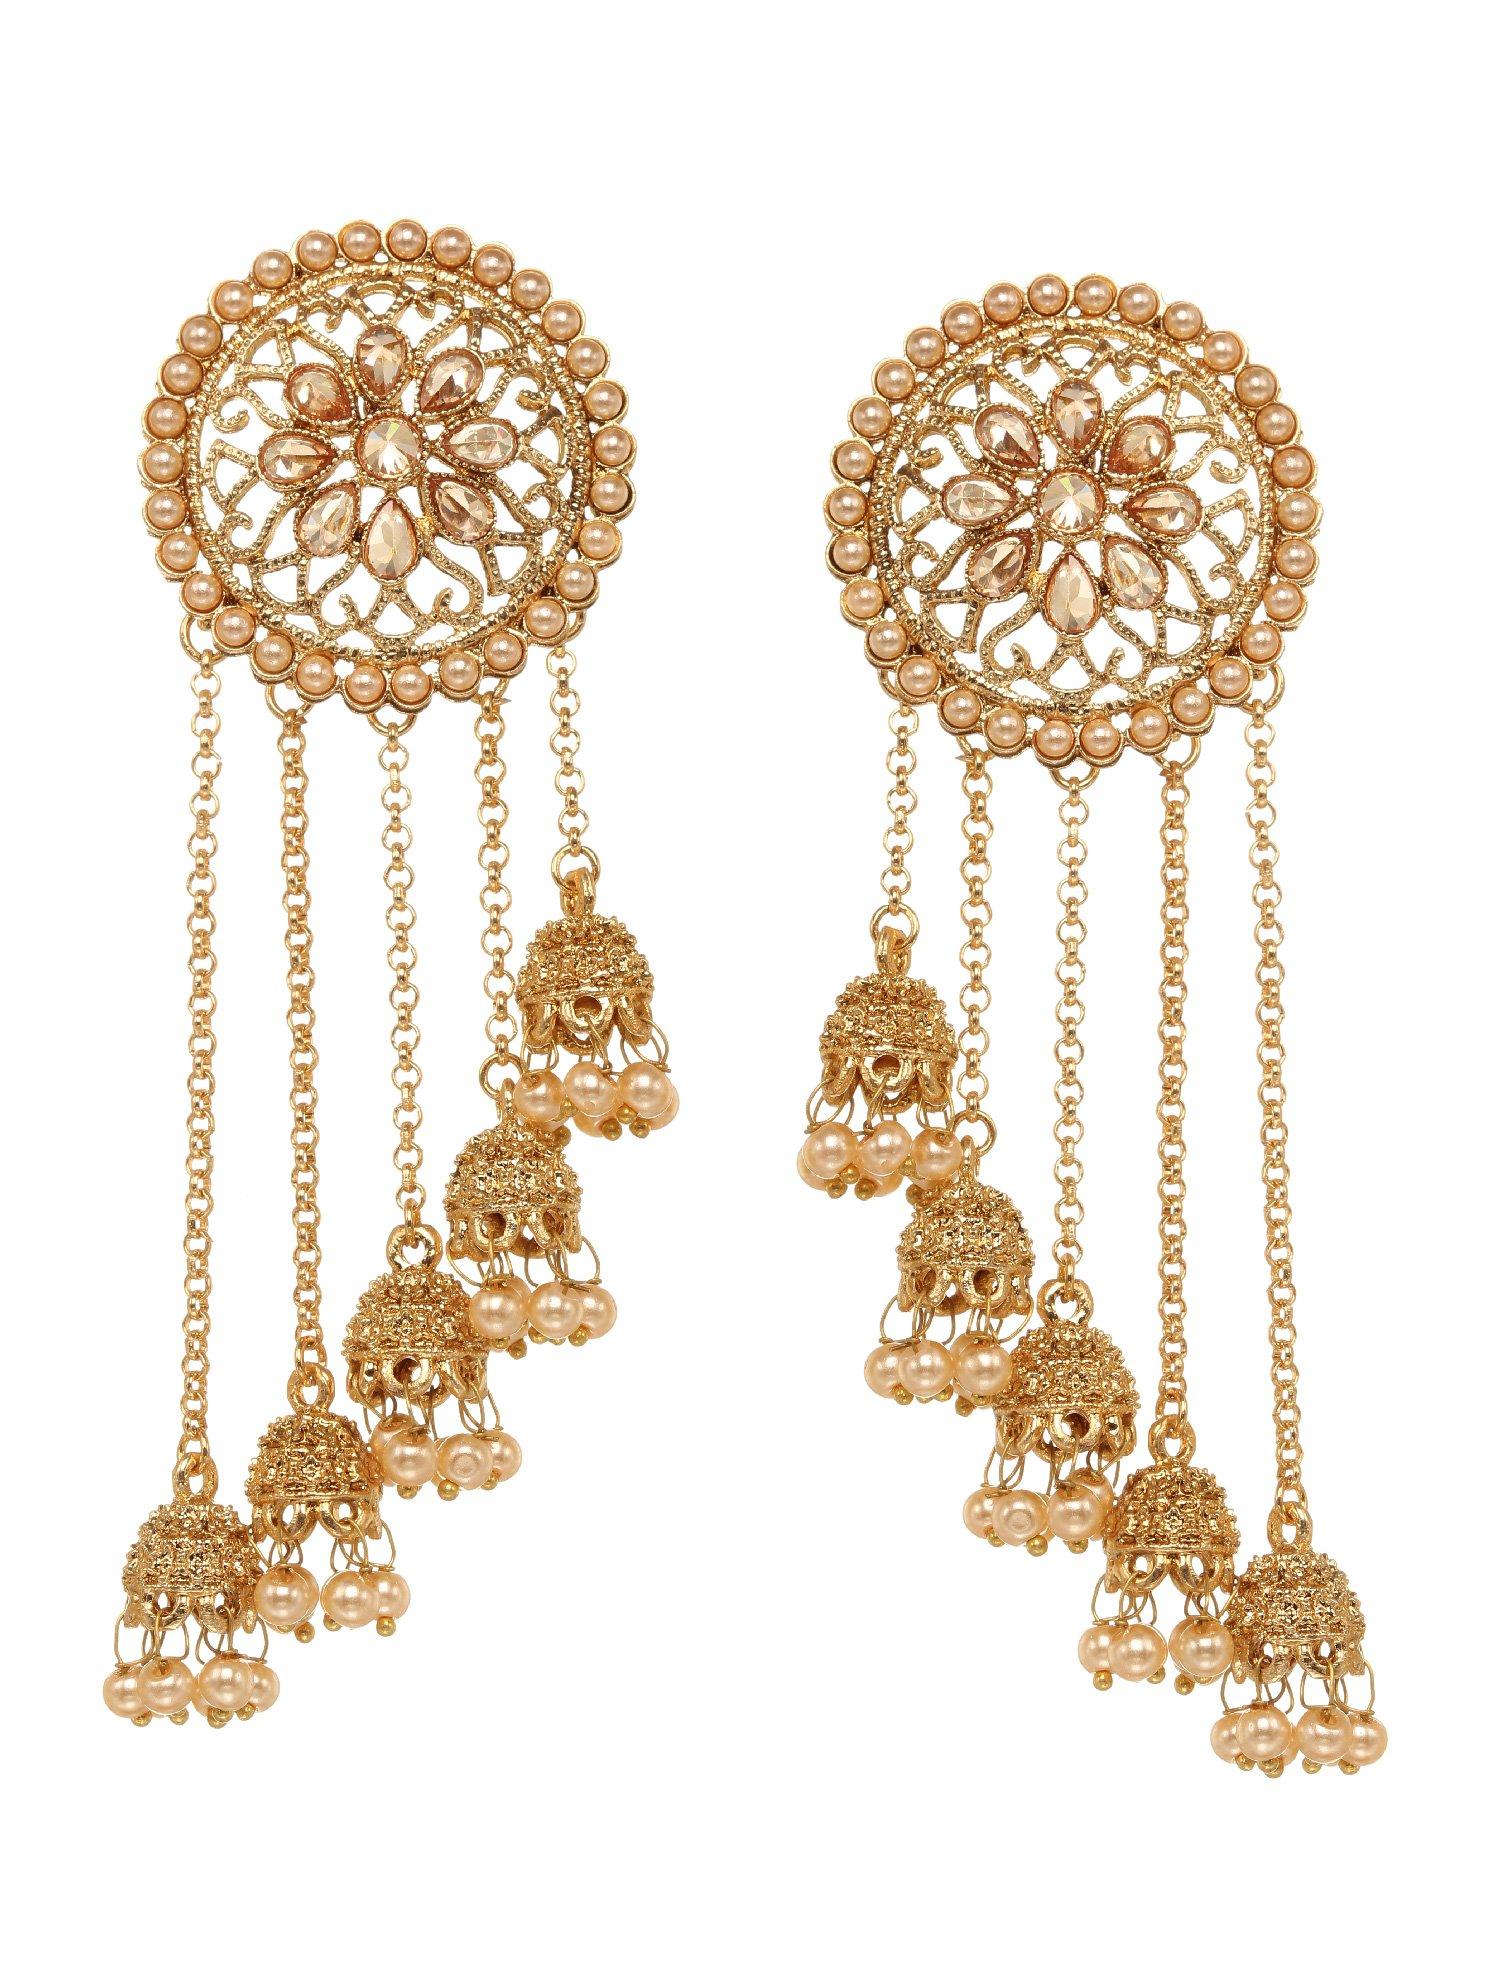 Bindhani Premium Quality Indian Wedding Jewelry Long Chain Indian Bahubali Bollywood Jhumka Jhumki Earrings For Women